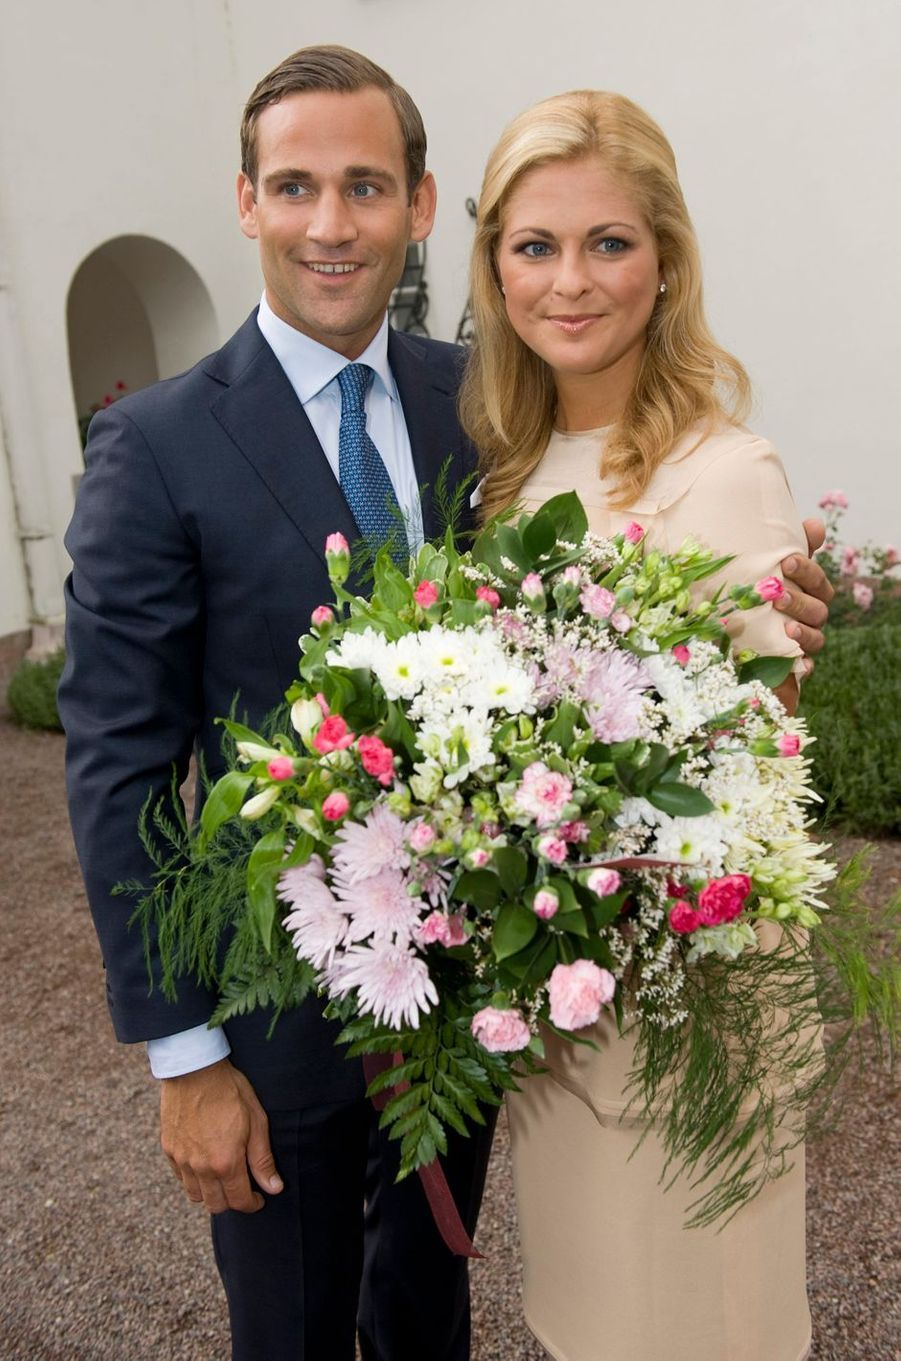 La princesse Madeleine de Suède avec son premier fiancé Jonas Bergstrom, le 11 août 2009